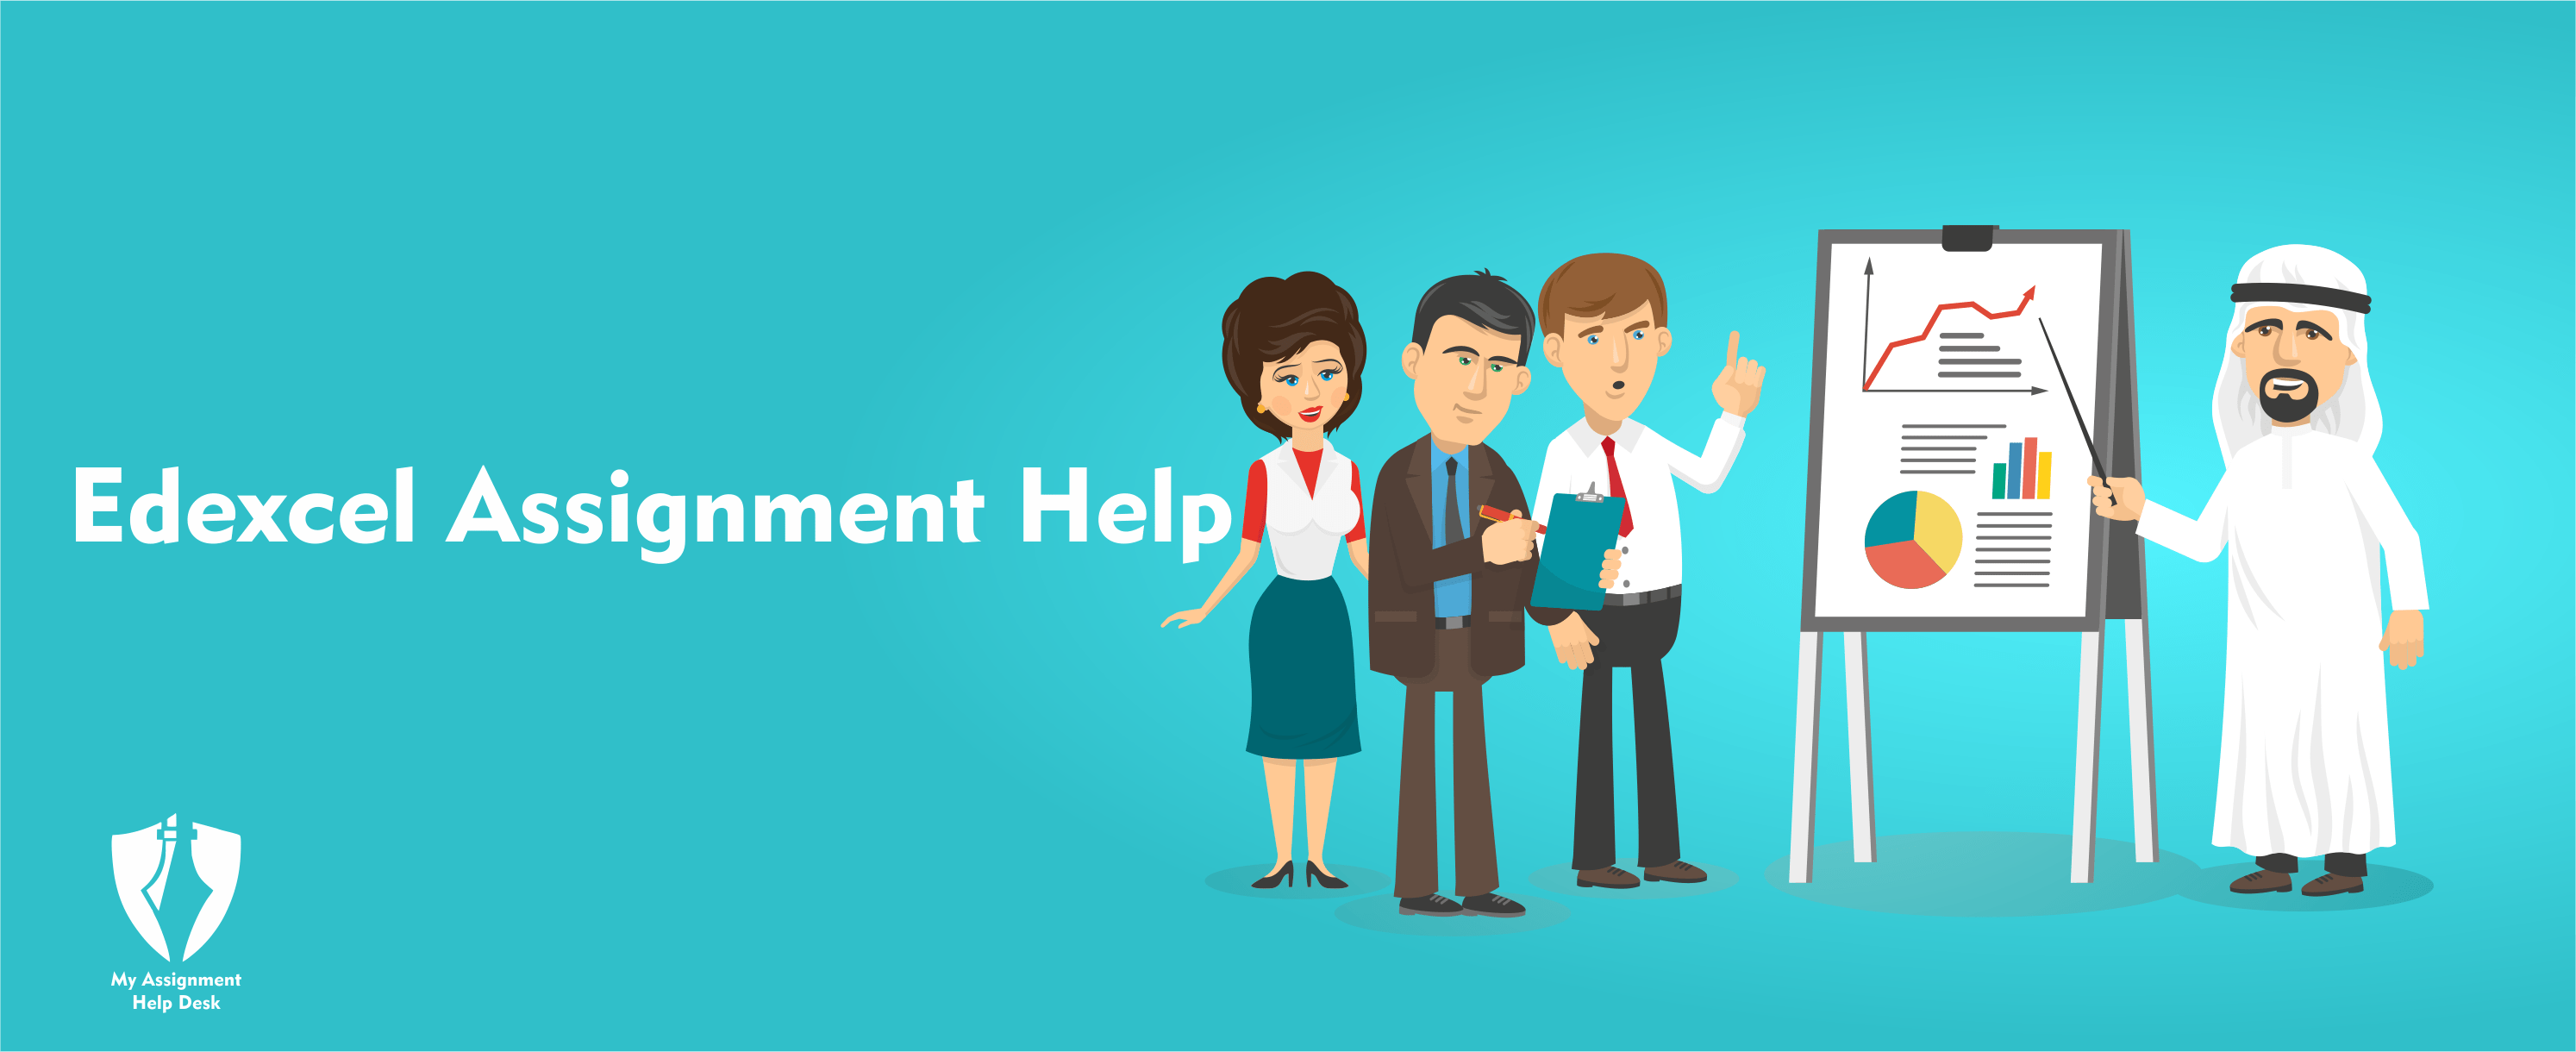 Edexcel Assignment Help